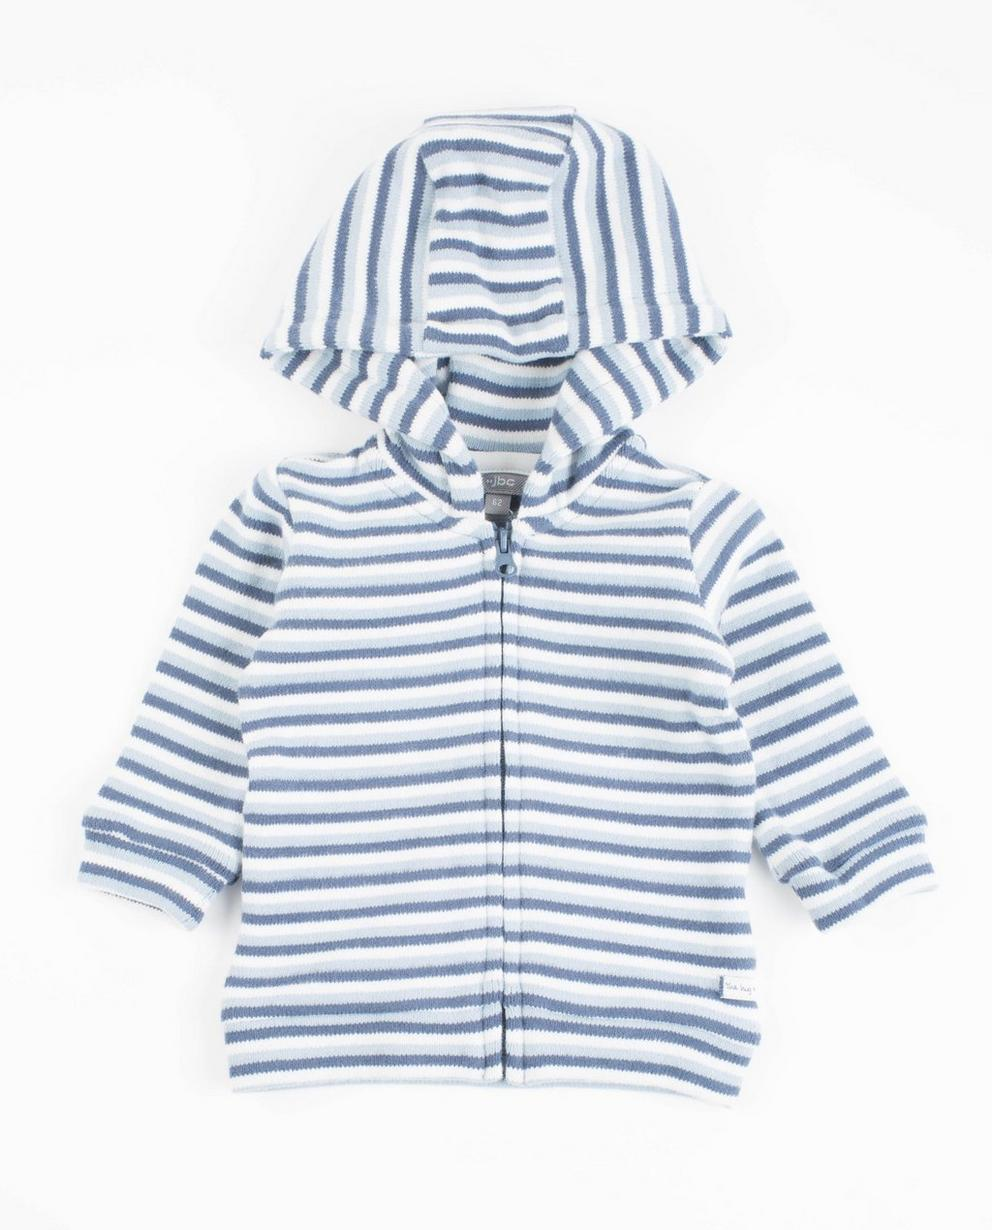 Gestreifte Jacke Kapuze - in Blau-Weiß - Newborn